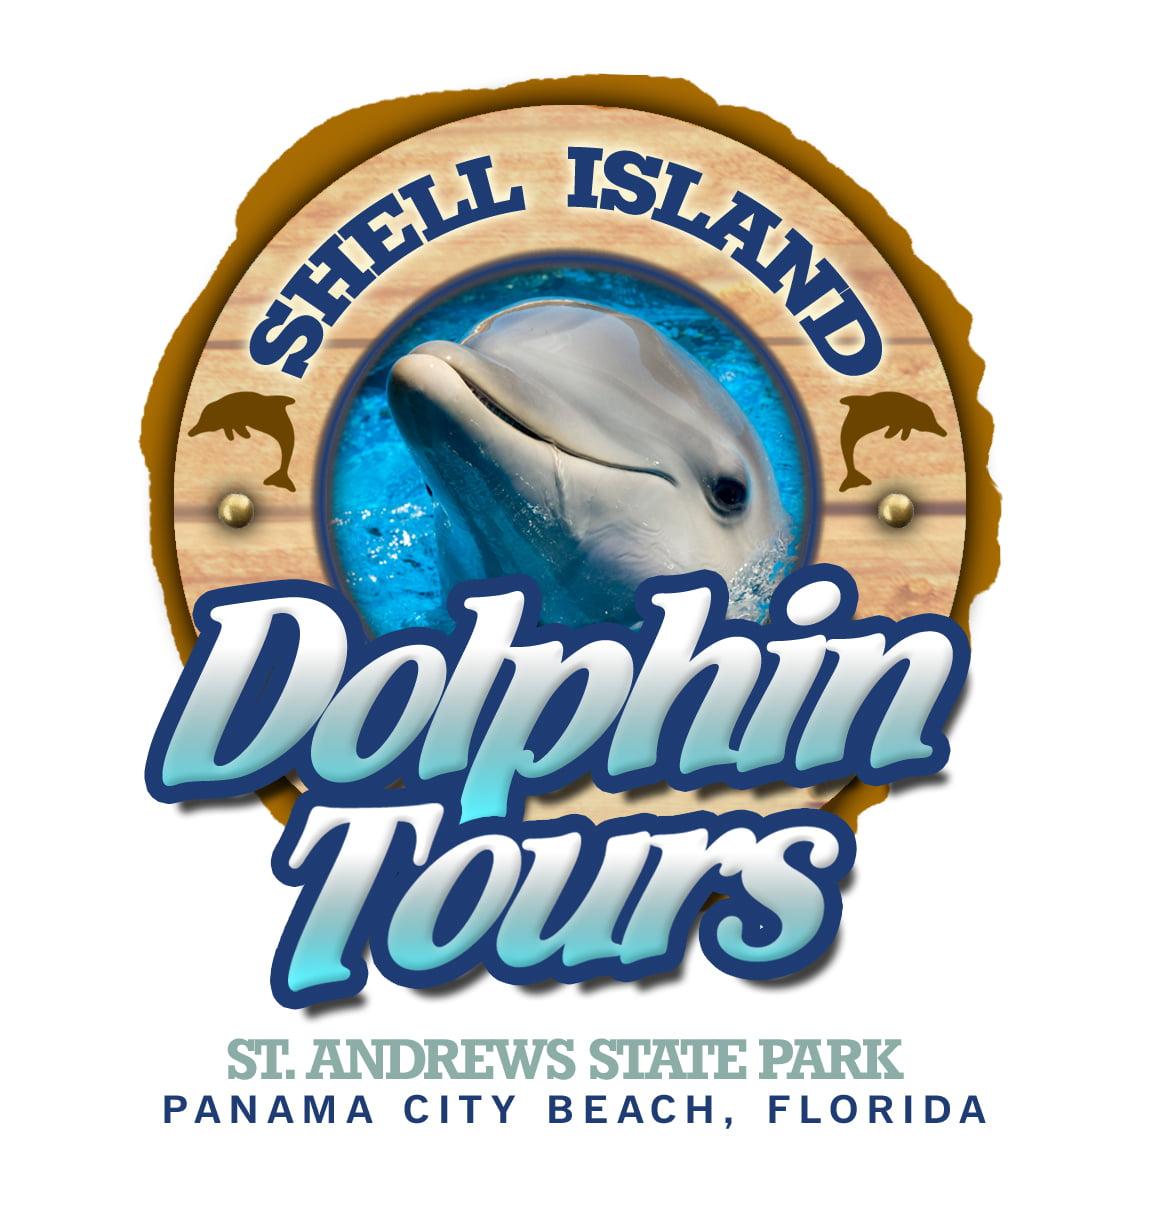 Panama City Beach Dolphin Tour